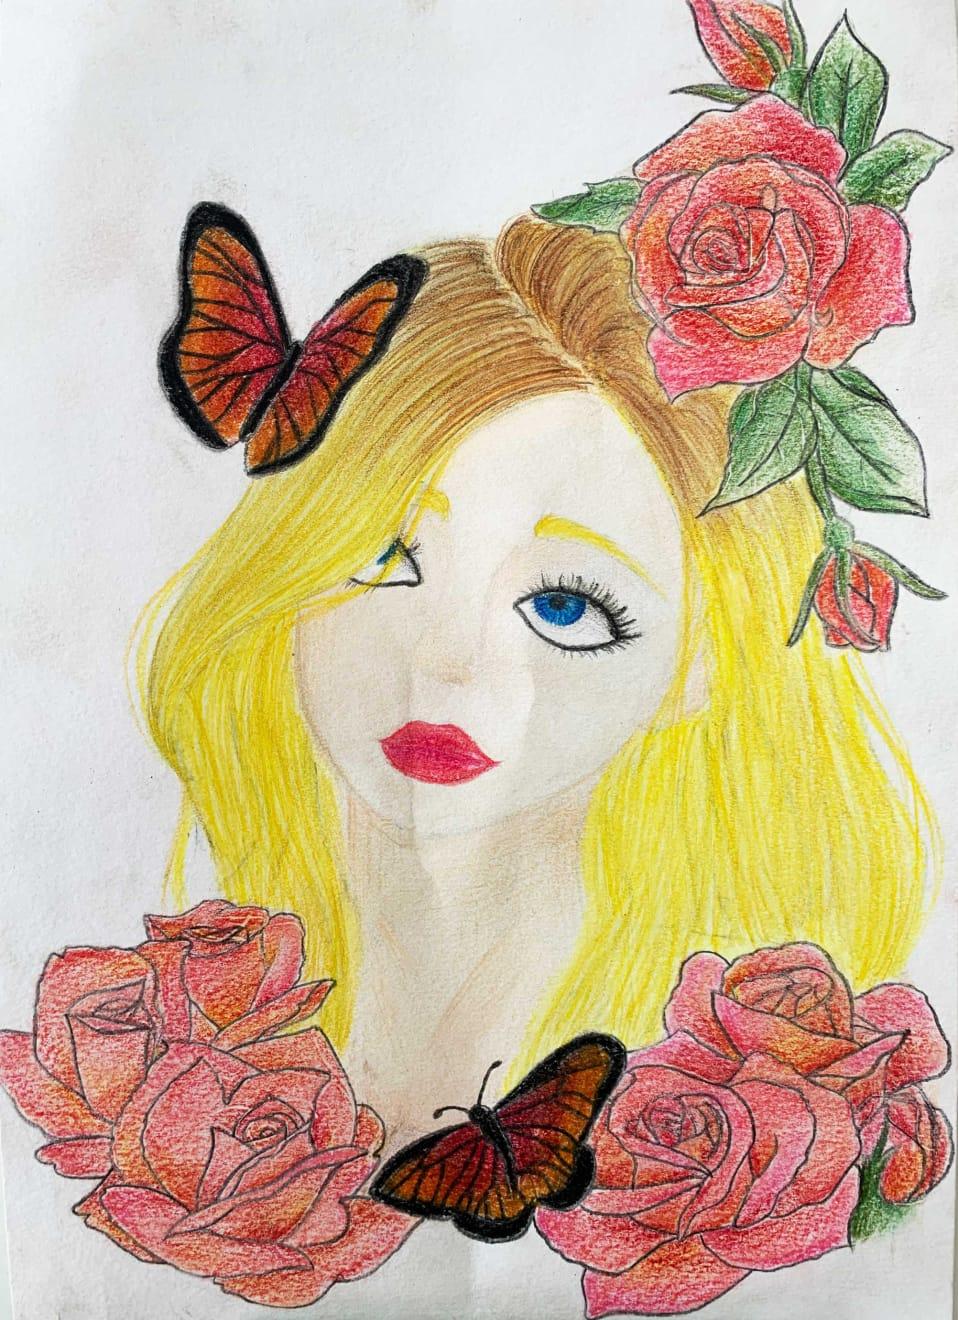 Julia Siwicka, Age 12, Untitled